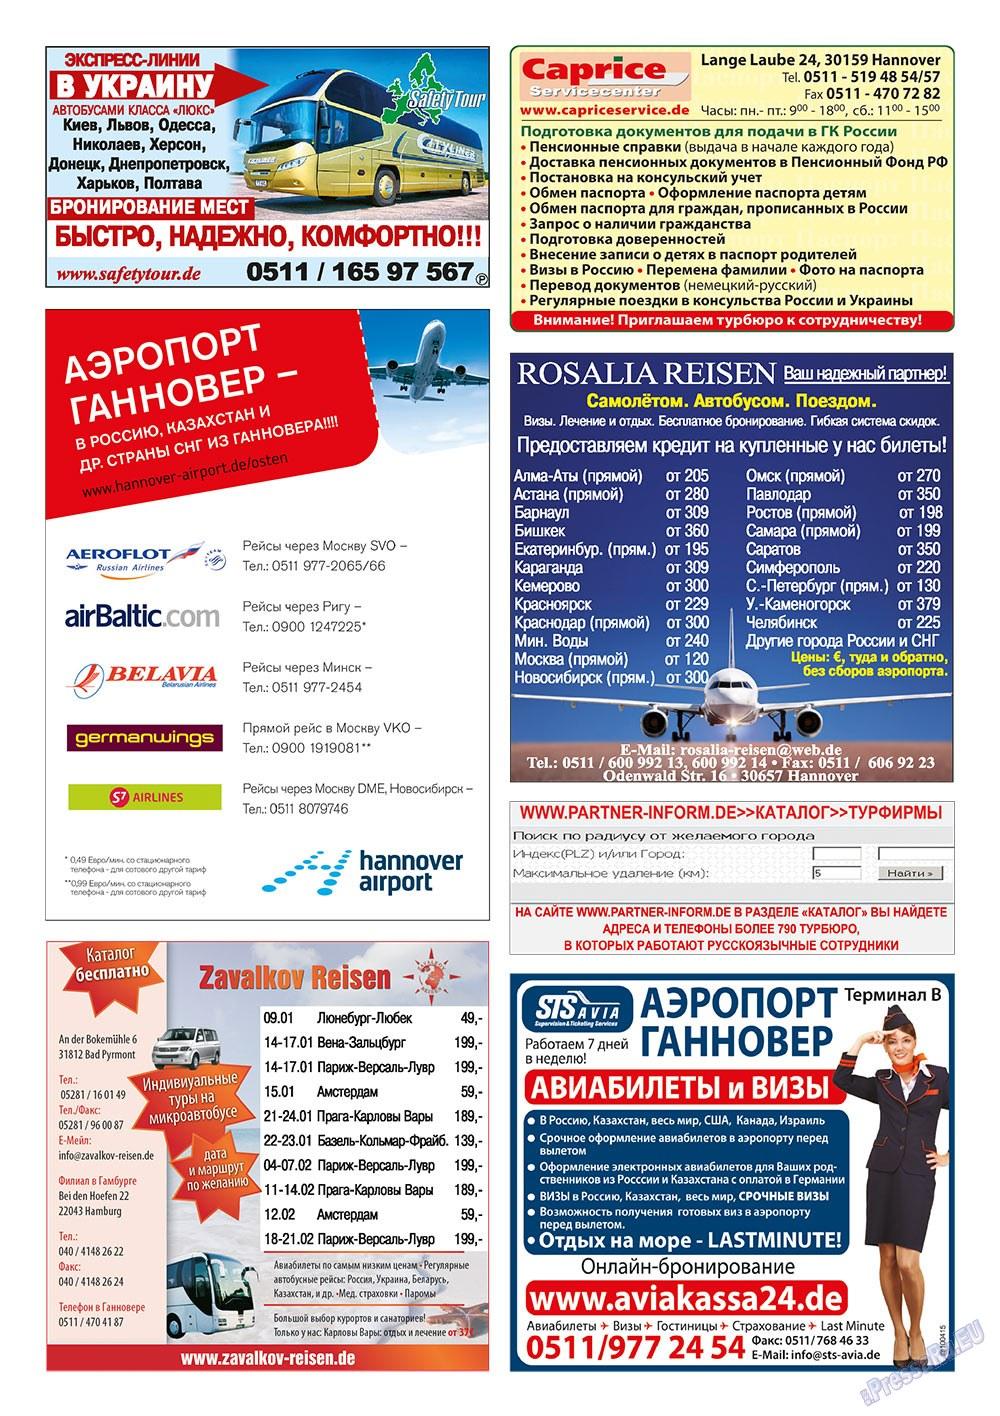 Партнер-север (журнал). 2011 год, номер 1, стр. 68